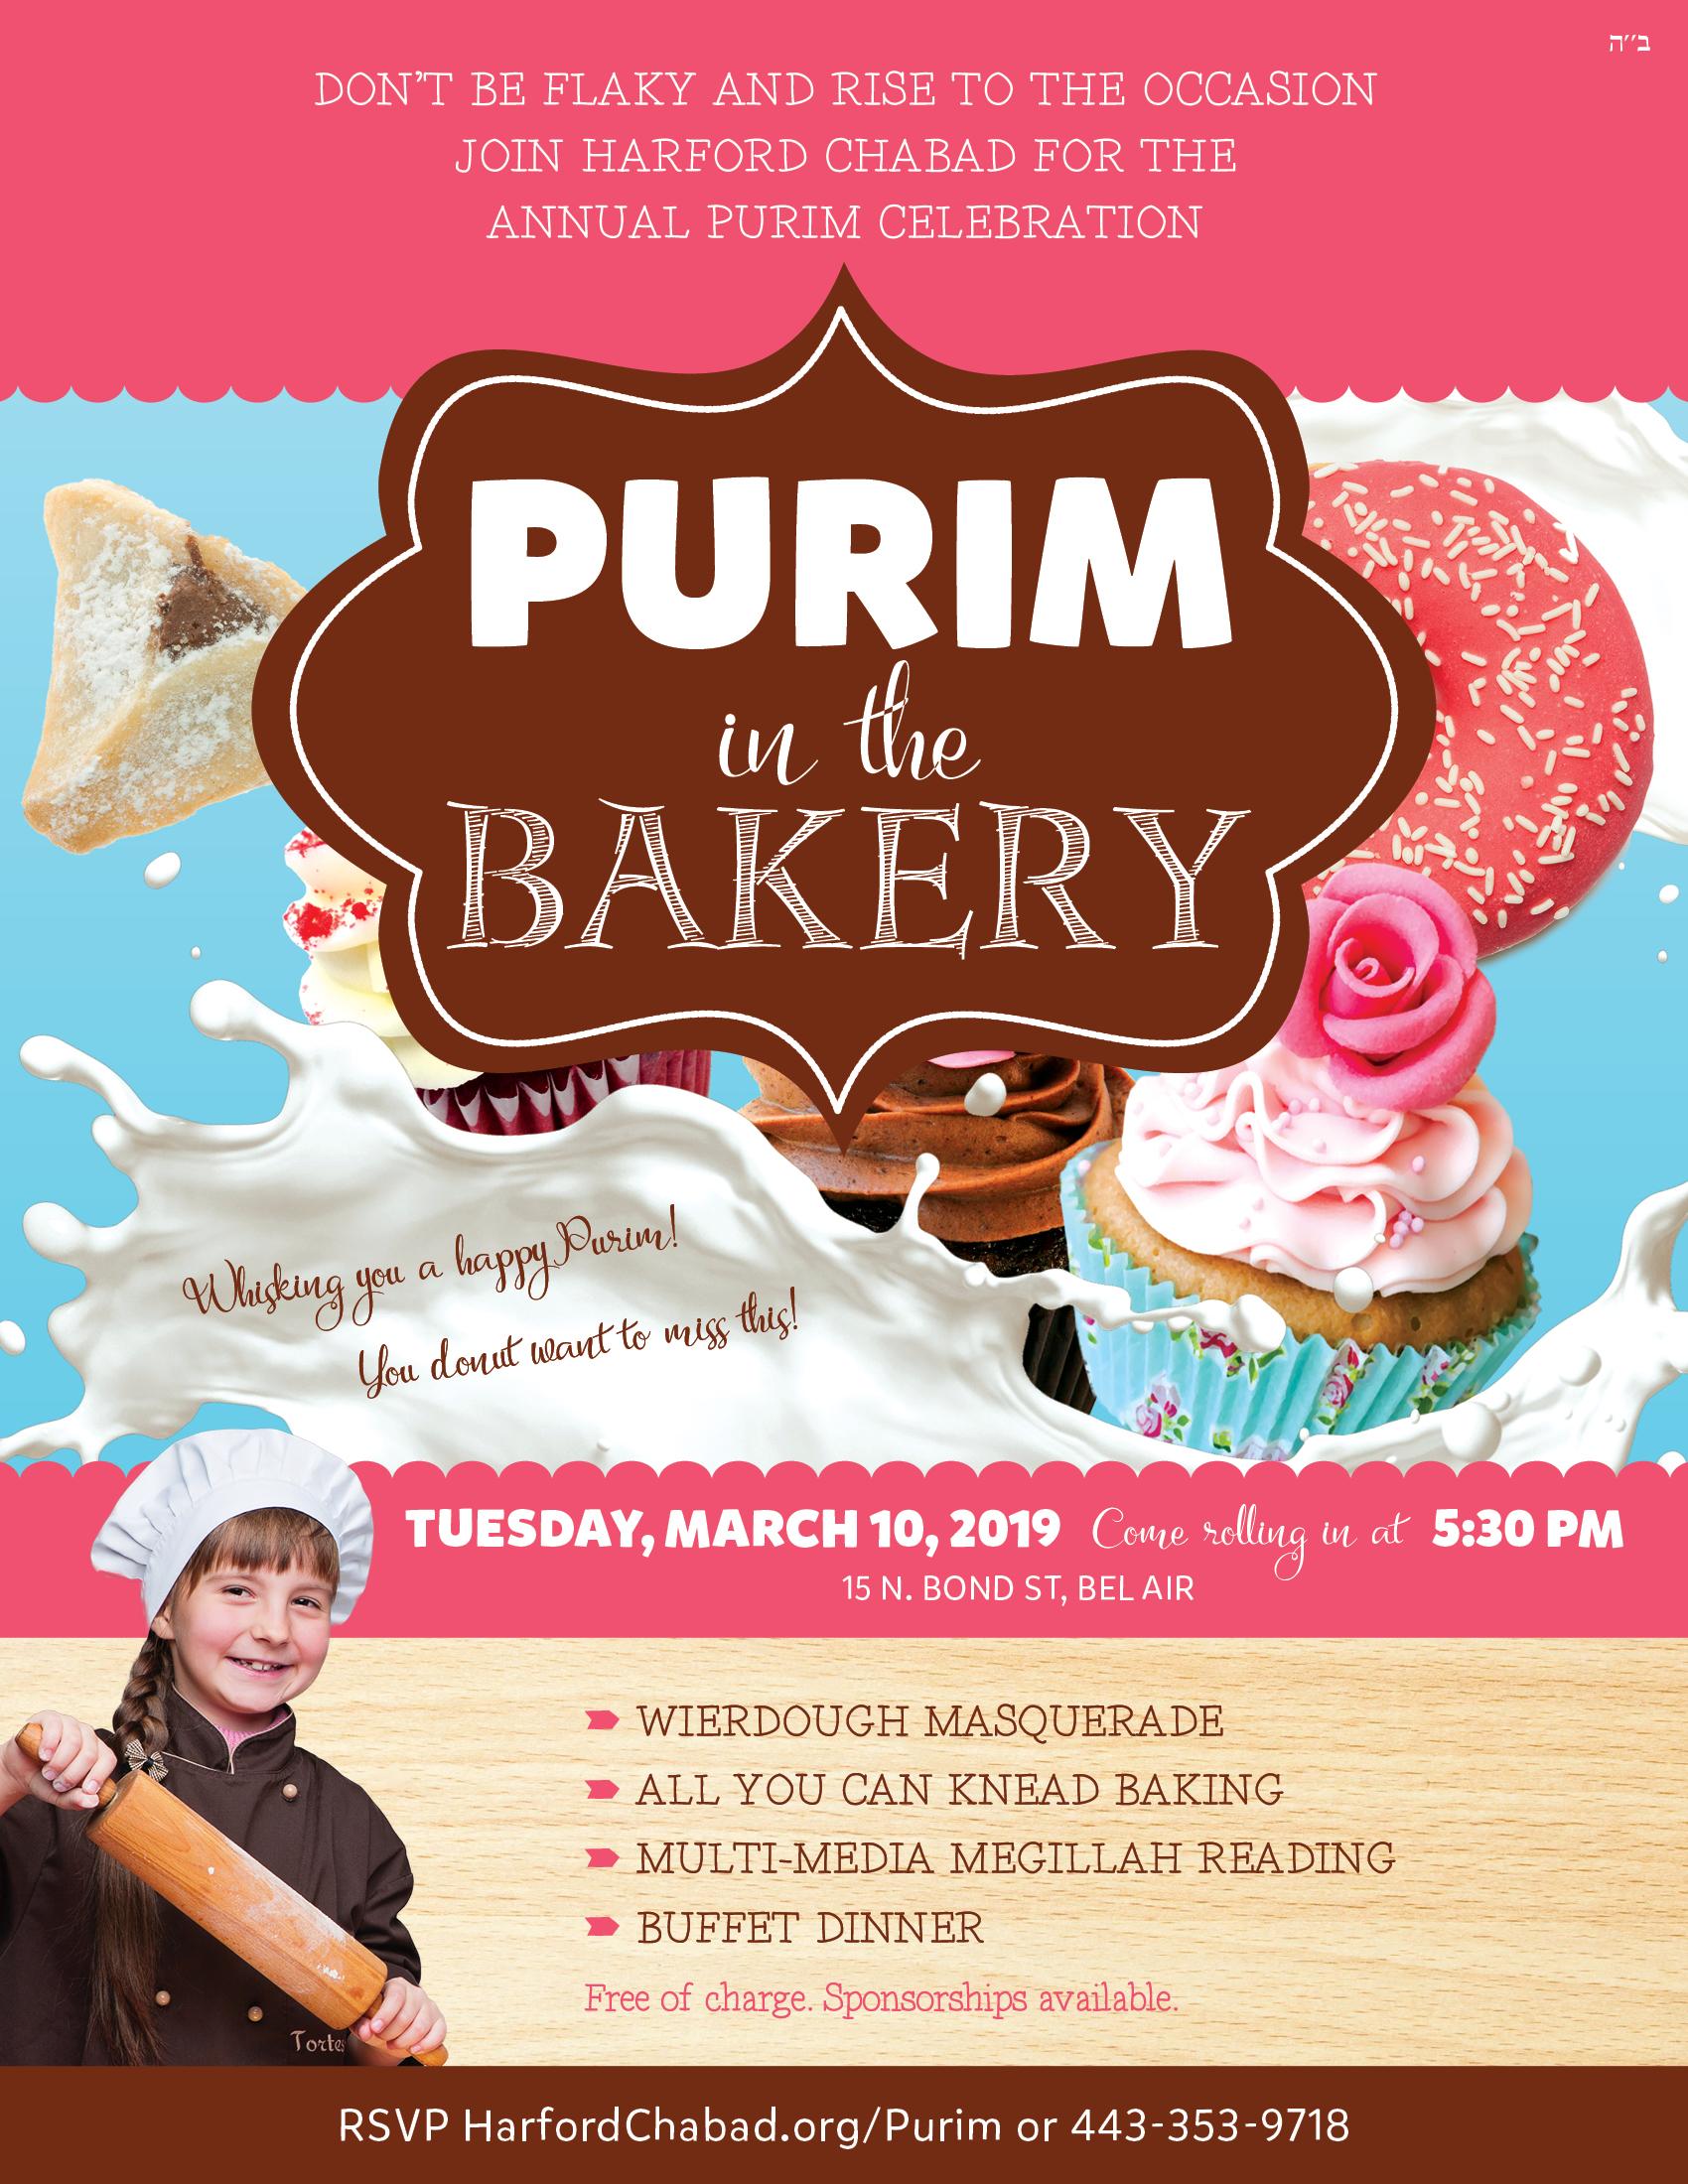 purim-bakery.jpg